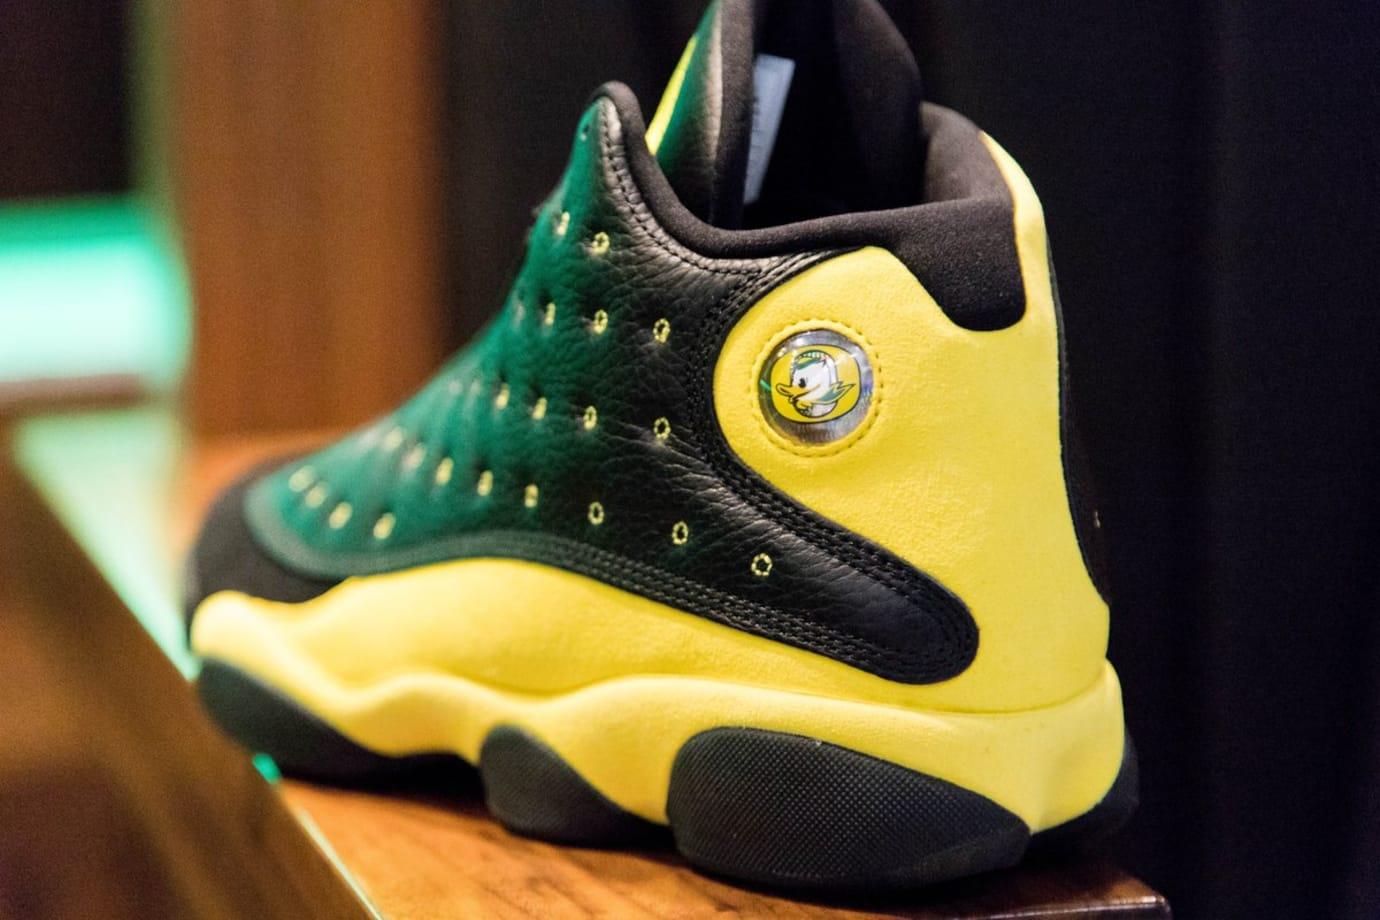 Air Jordan 13 Retro  Oregon Ducks  Track and Field PE Sneakers ... 93702bf37